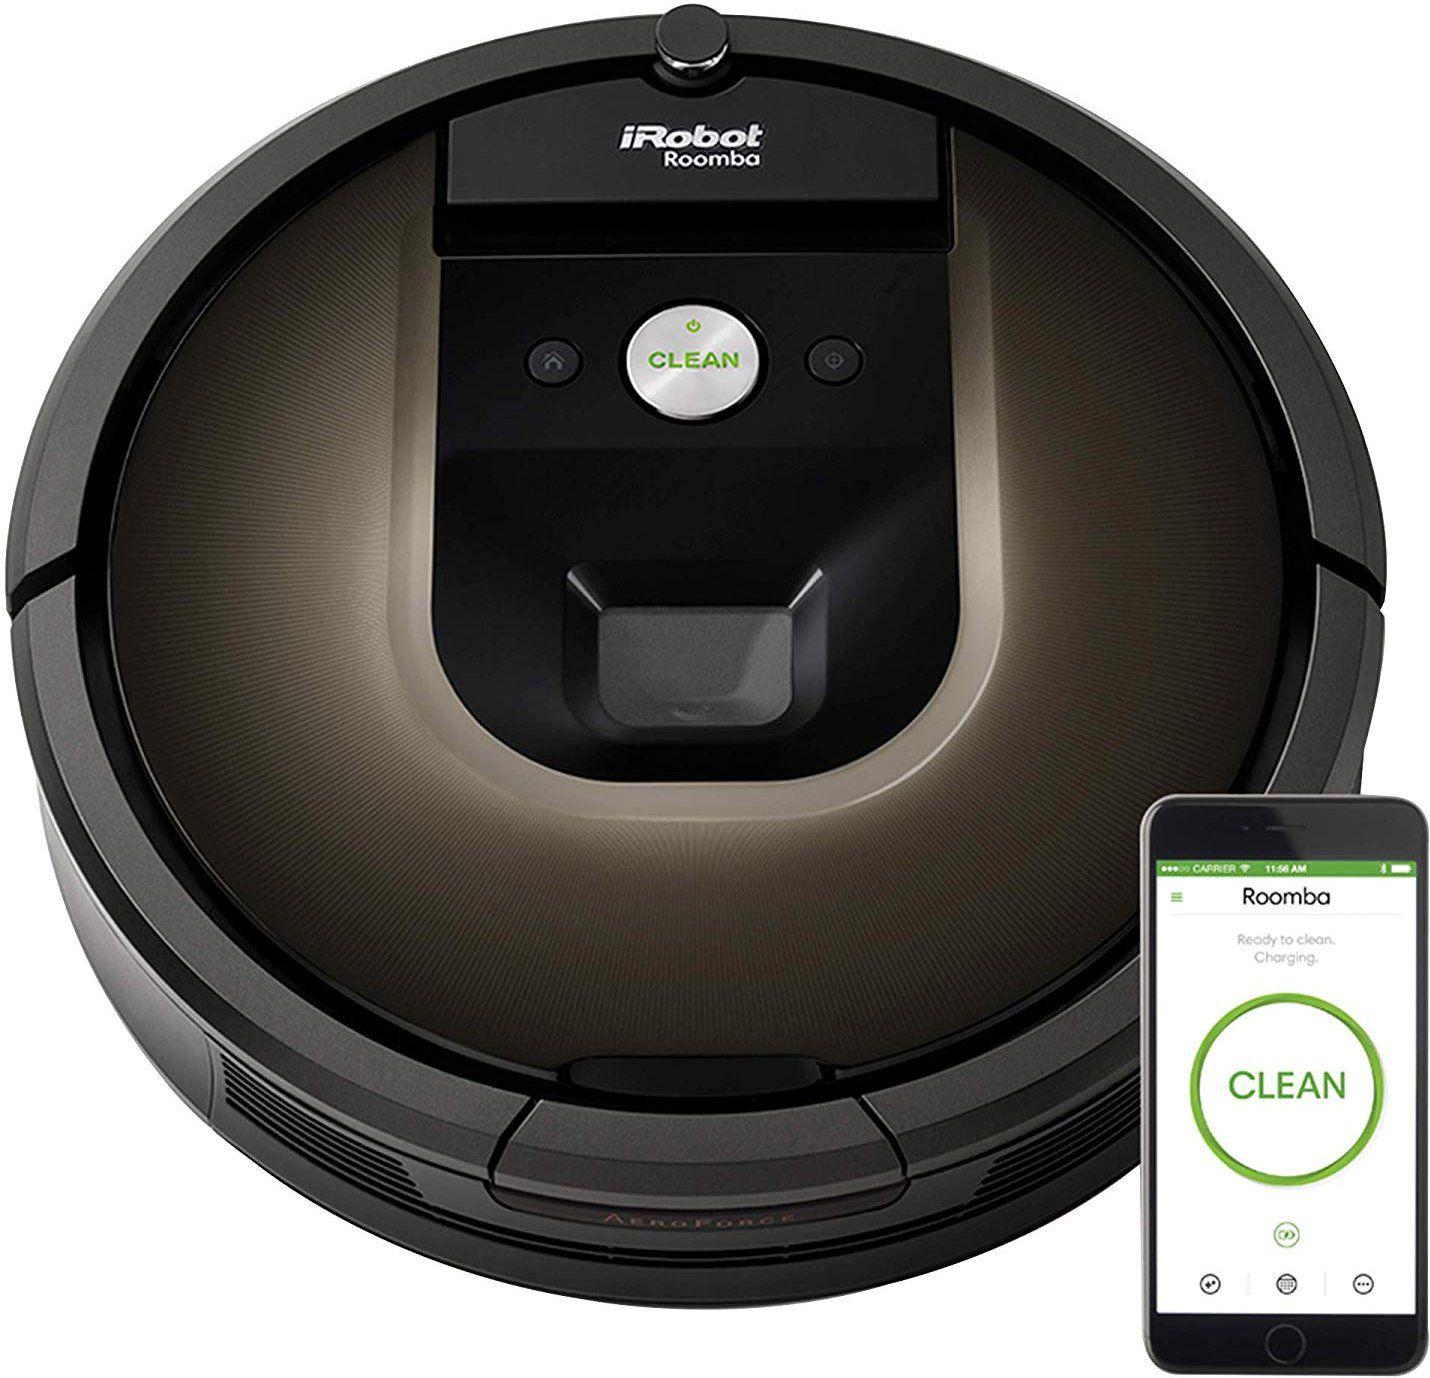 News Irobot Roomba 980 Vs Roborock S6 Which Smart Vacuum Should You Buy Roomba Vacuum Irobot Roomba Irobot